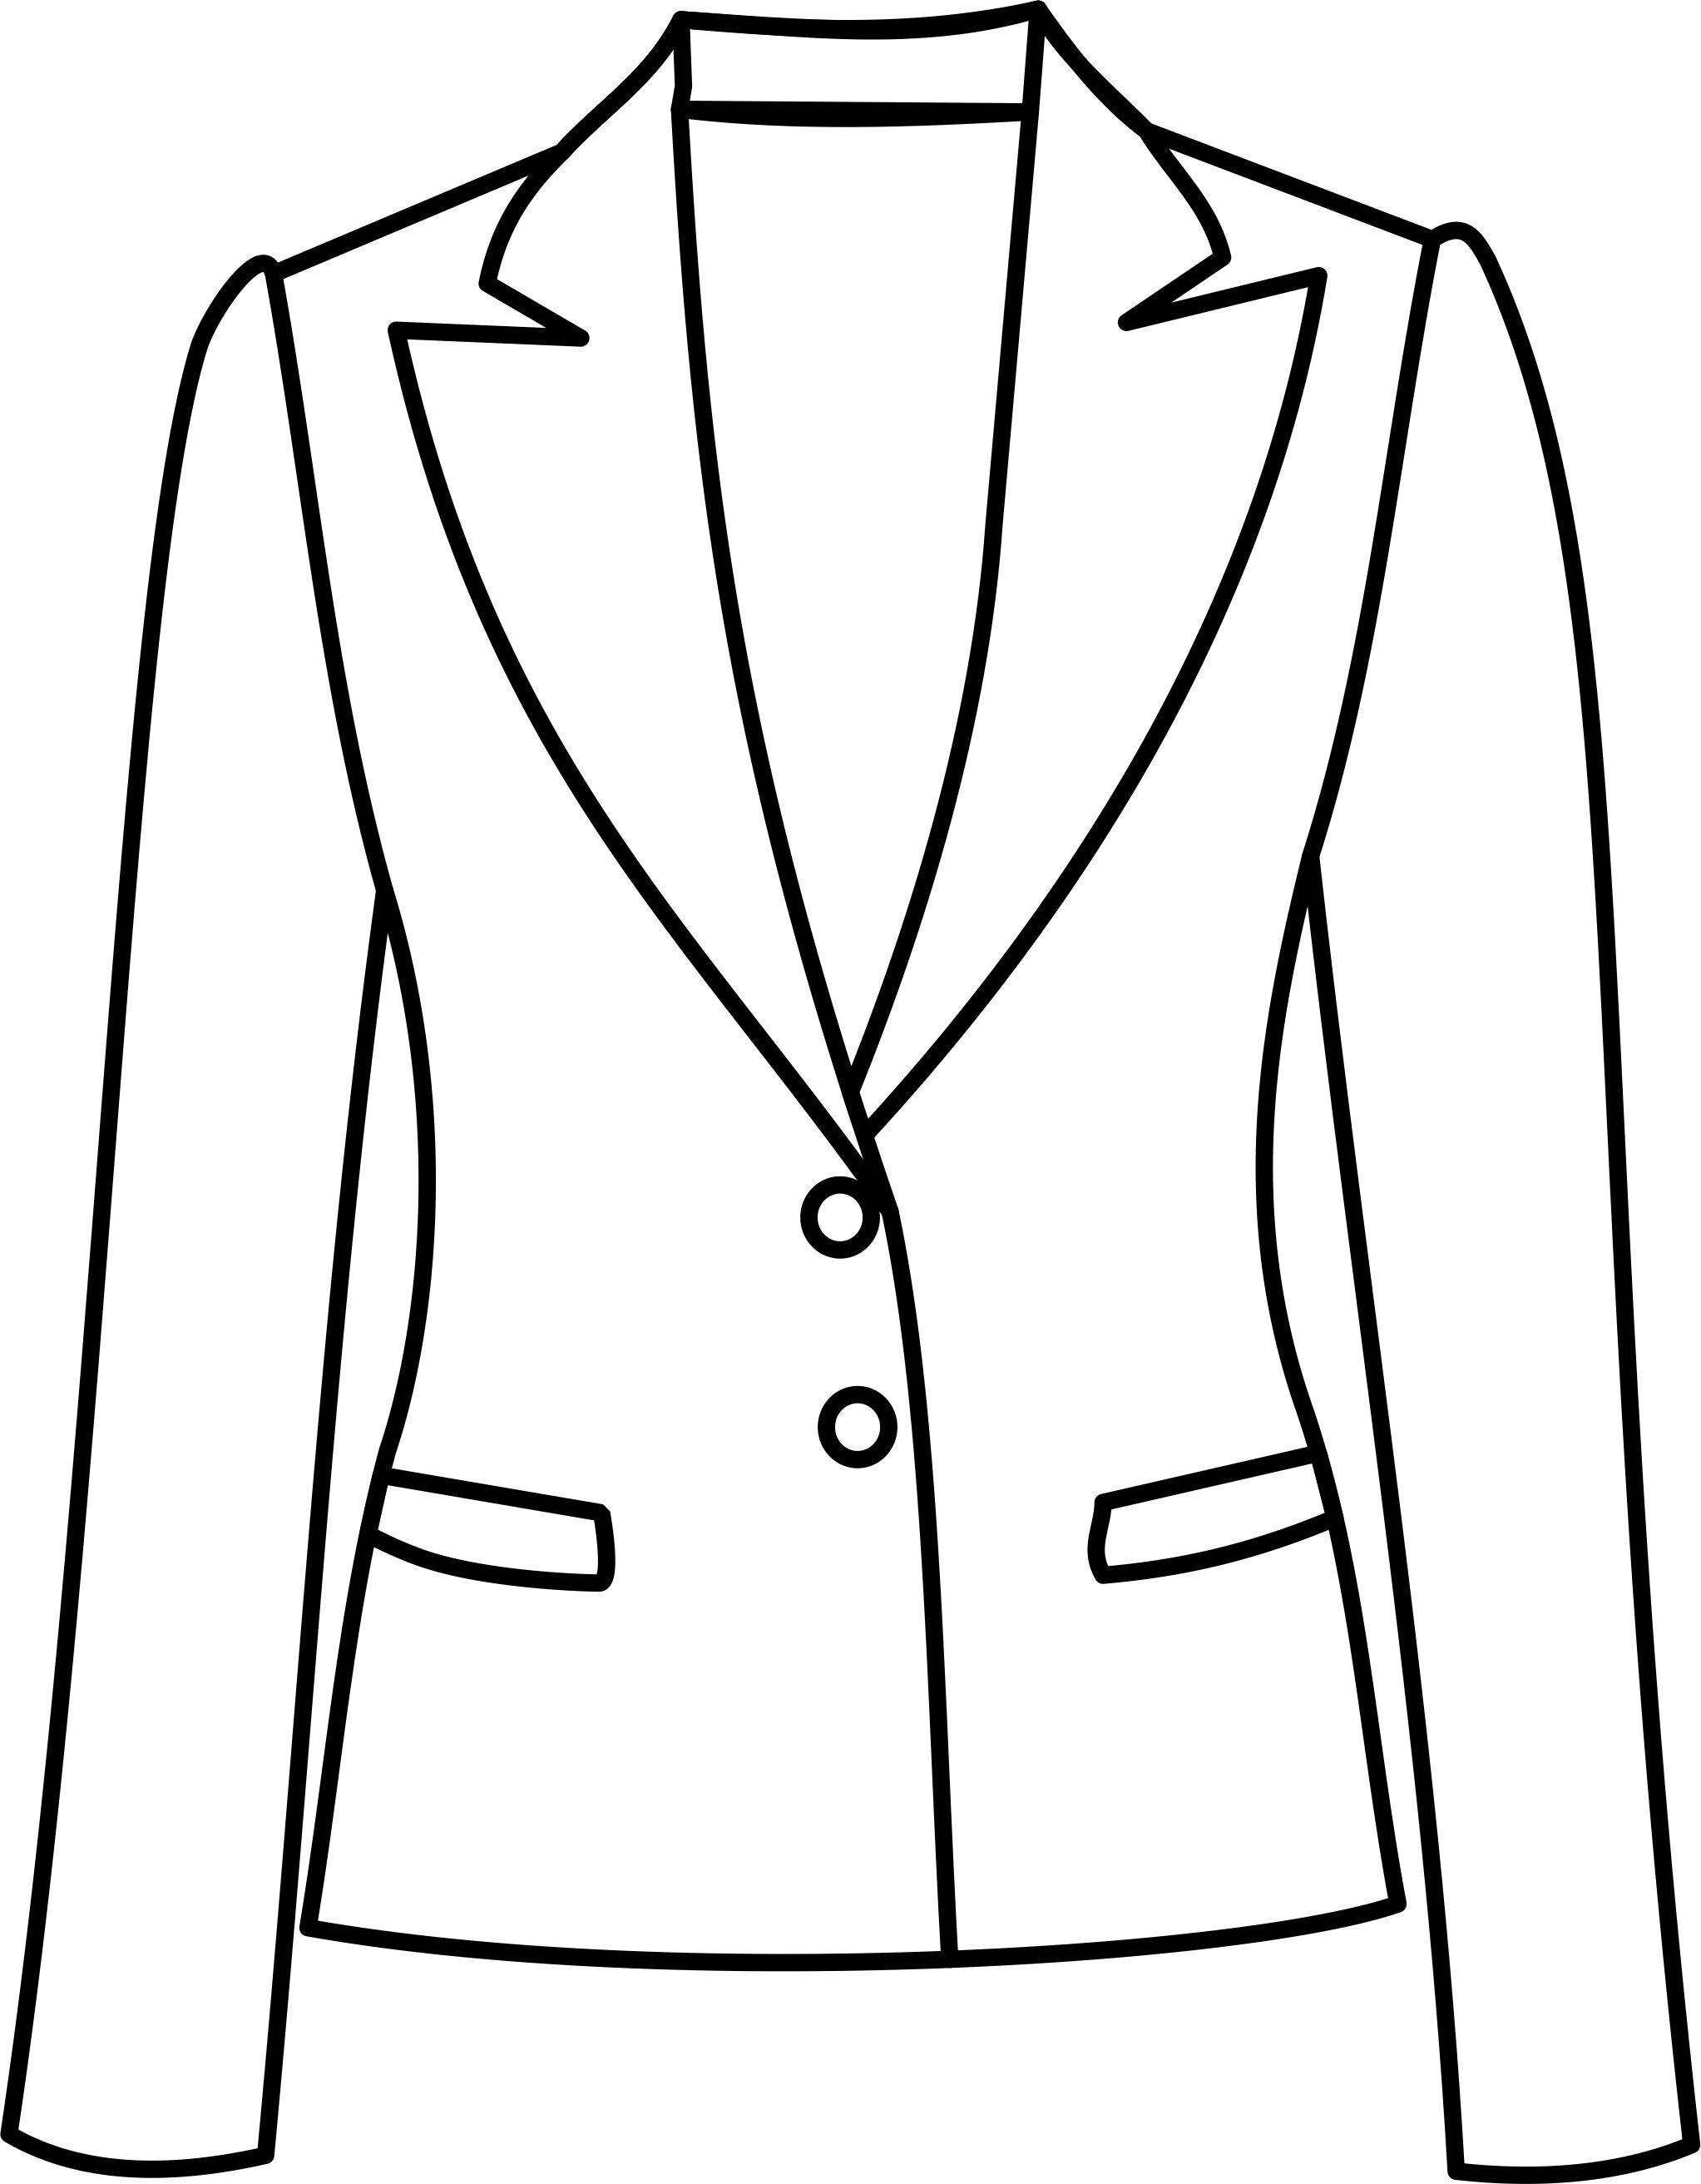 desain jas vector rajasthan board g desain jas vector rajasthan board g